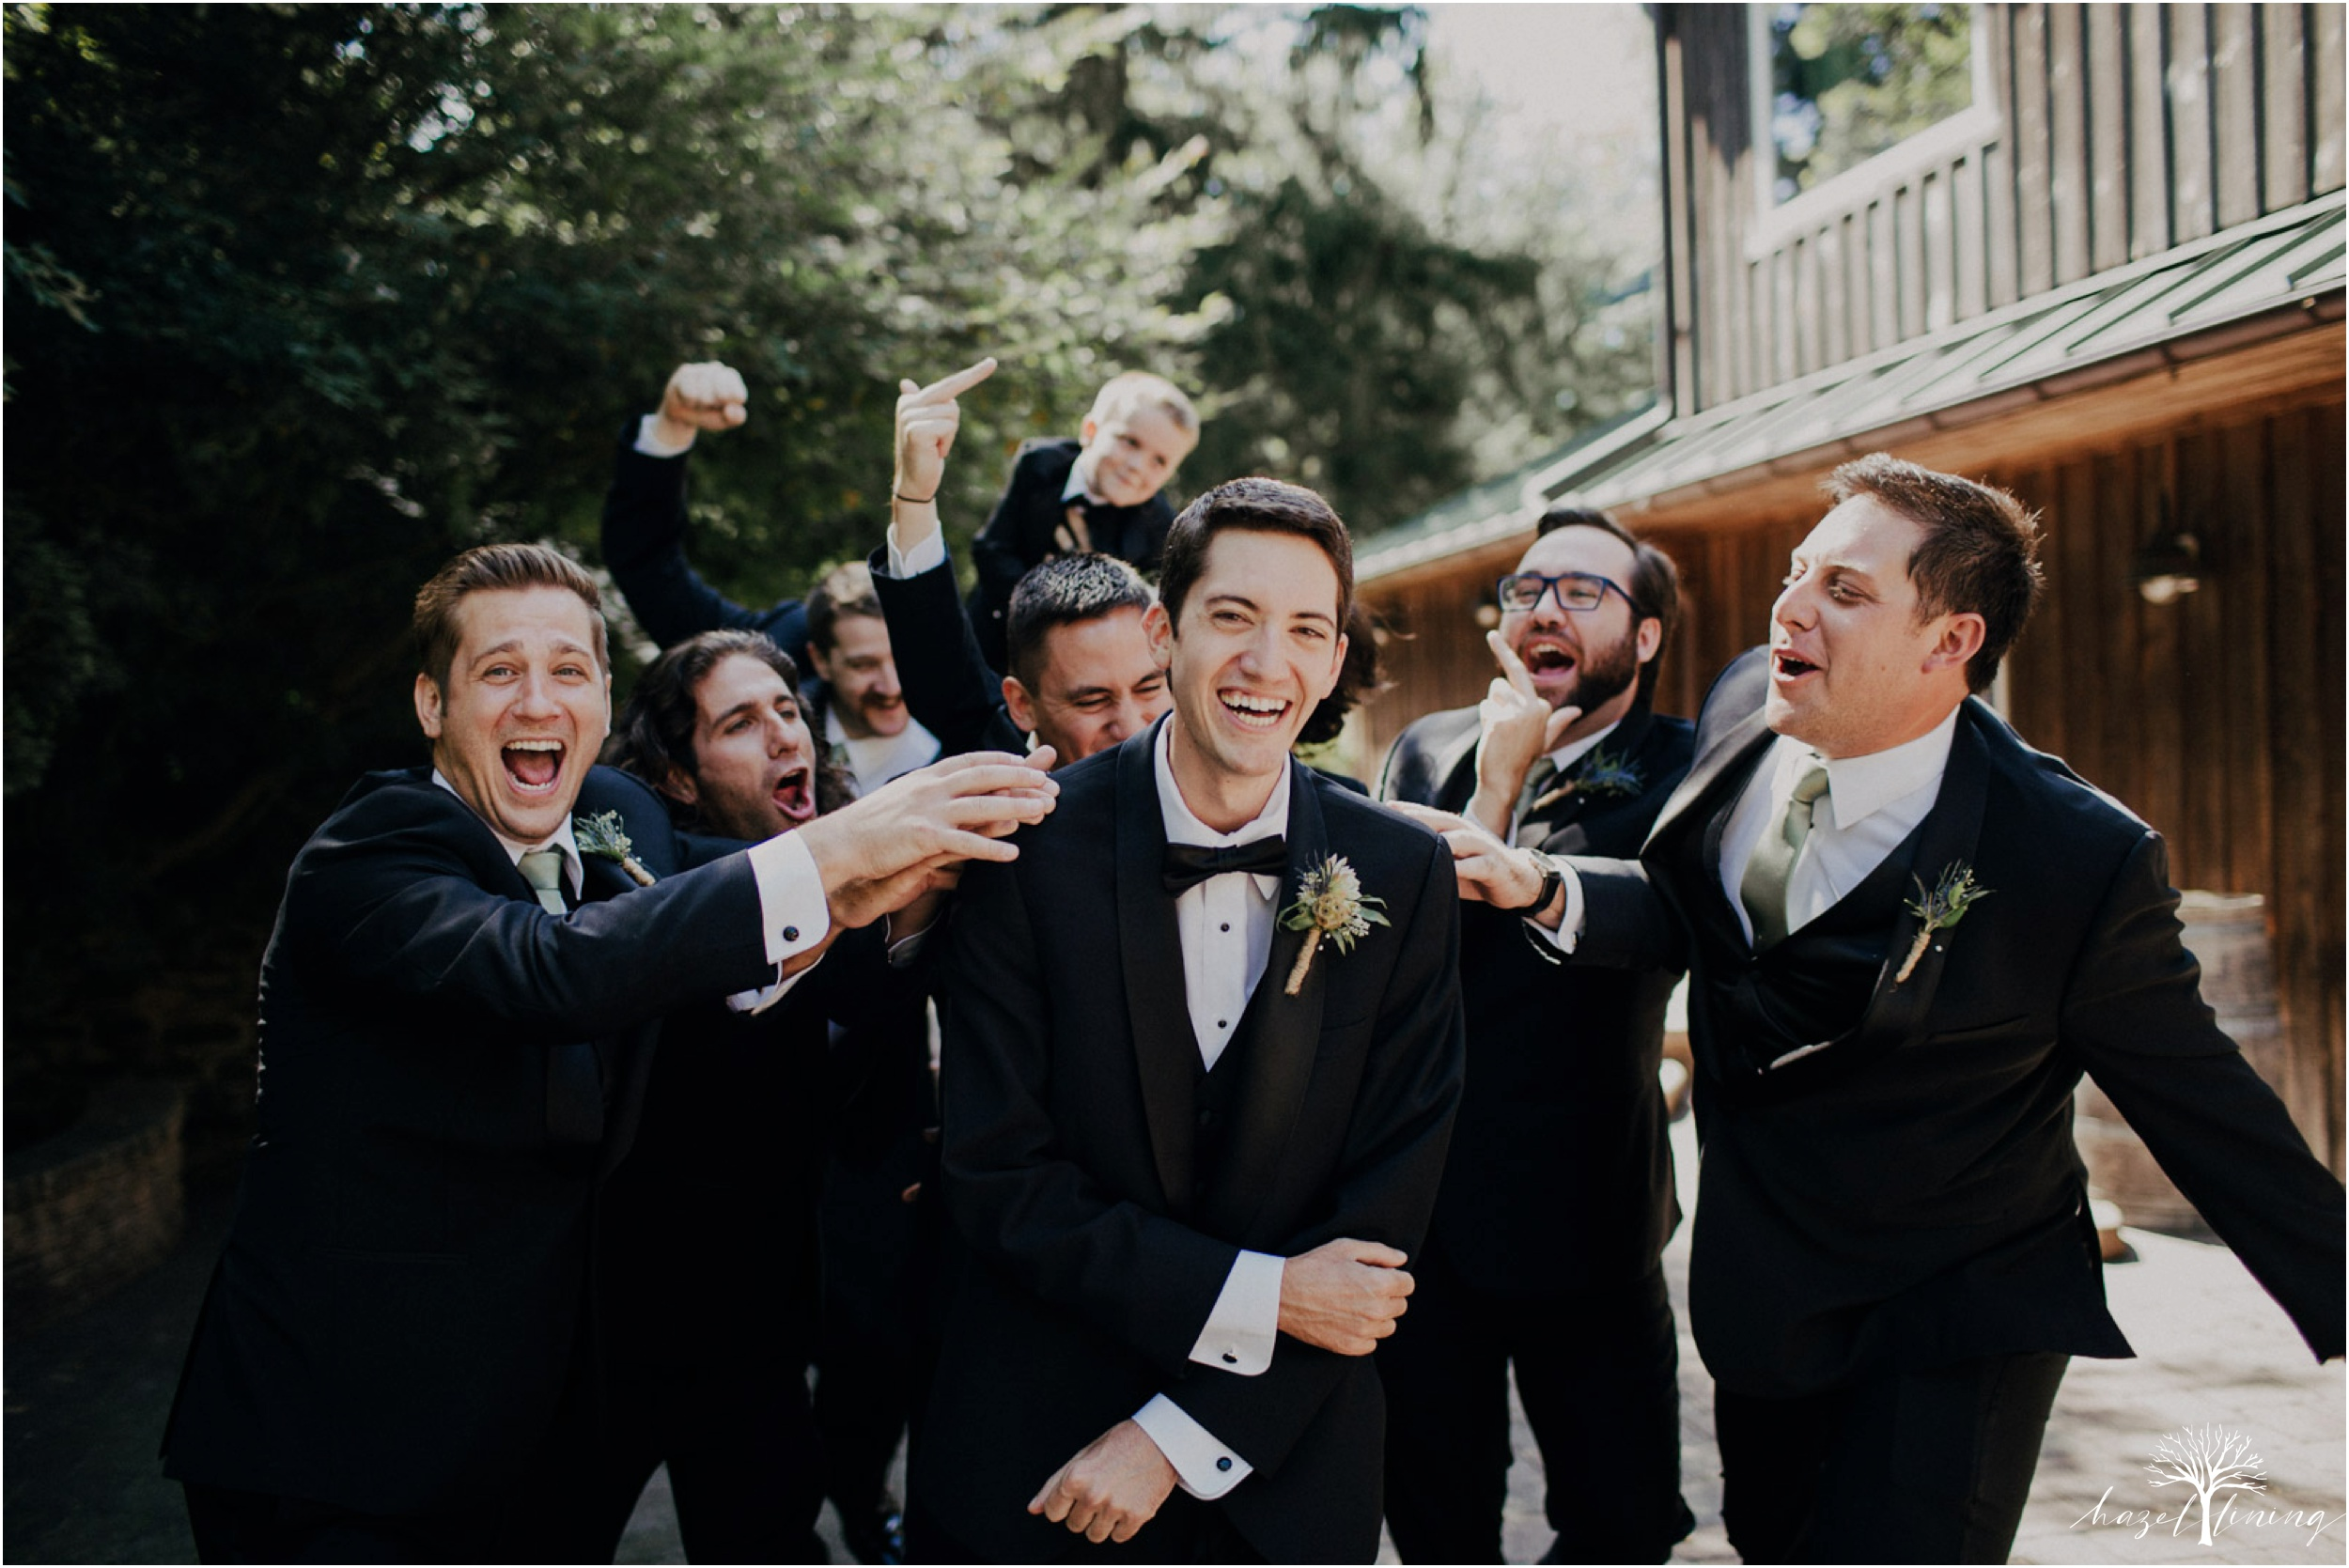 maureen-hepner-anthony-giordano-rose-bank-winery-newtow-pennsylvania-luxury-summer-wedding-hazel-lining-photography-destination-elopement-wedding-engagement-photography_0051.jpg